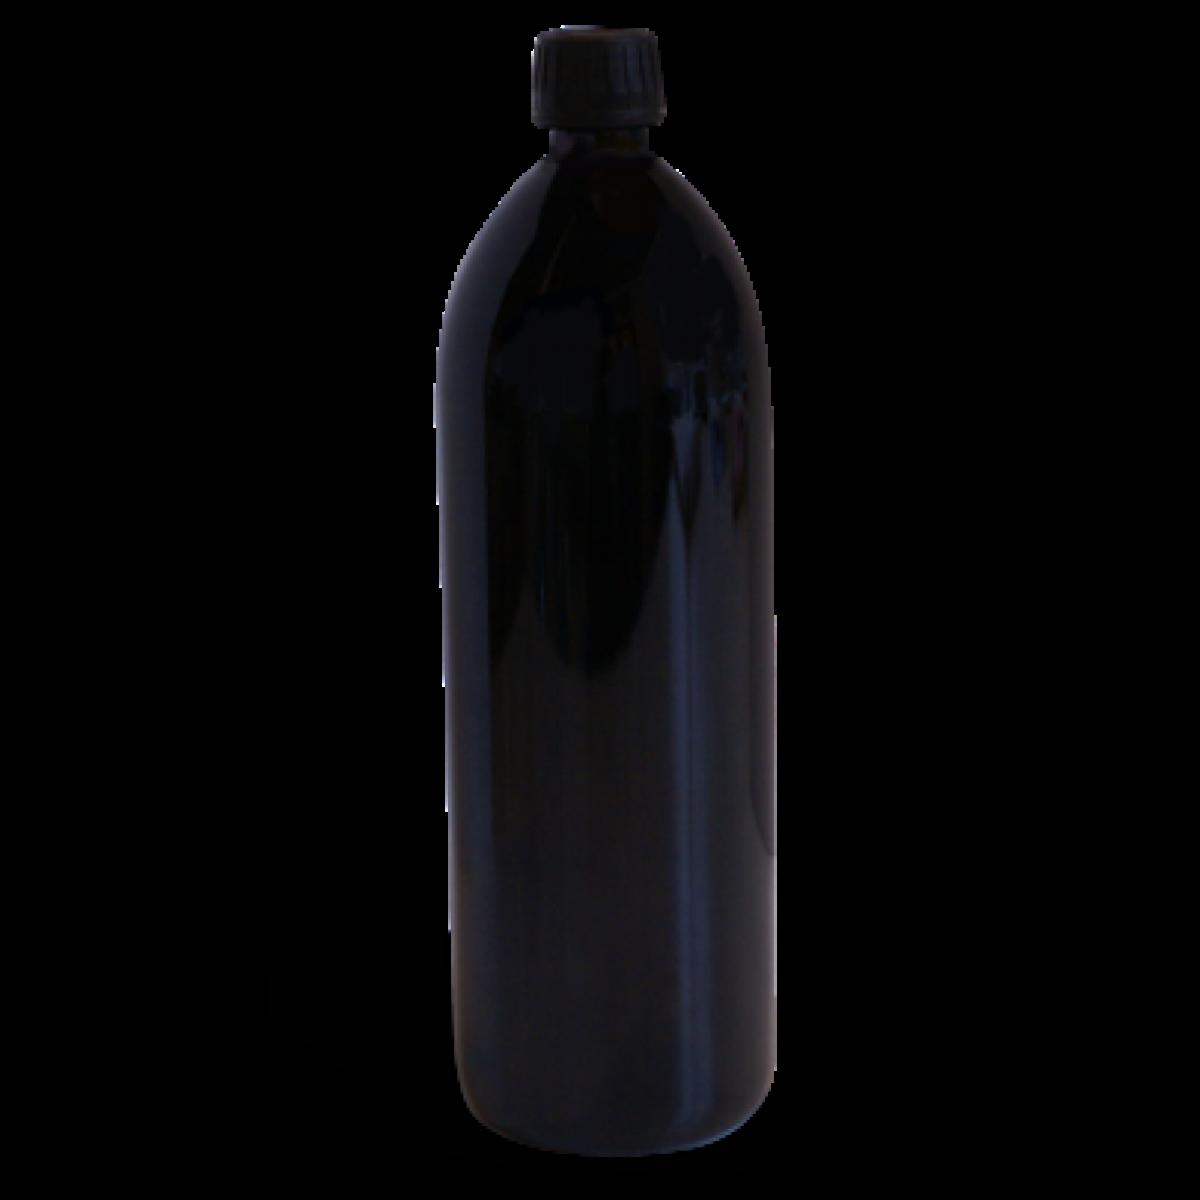 Miron Glass Uk Miron Glass Bottle Dark Violet Glass 1